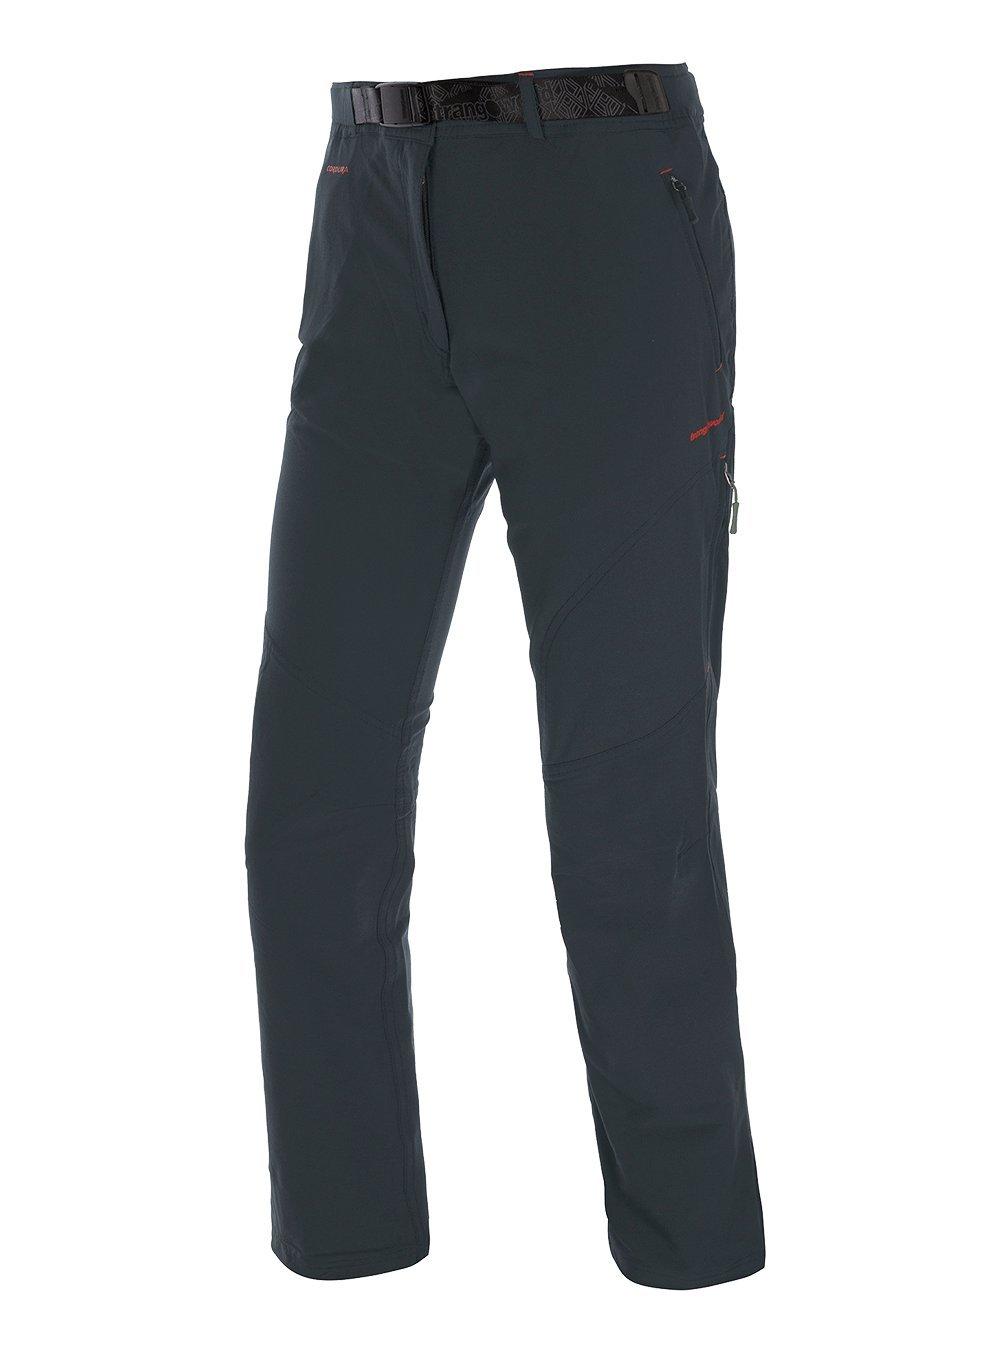 gris (anthracite) Trangoworld magoian Pantalons Longs L